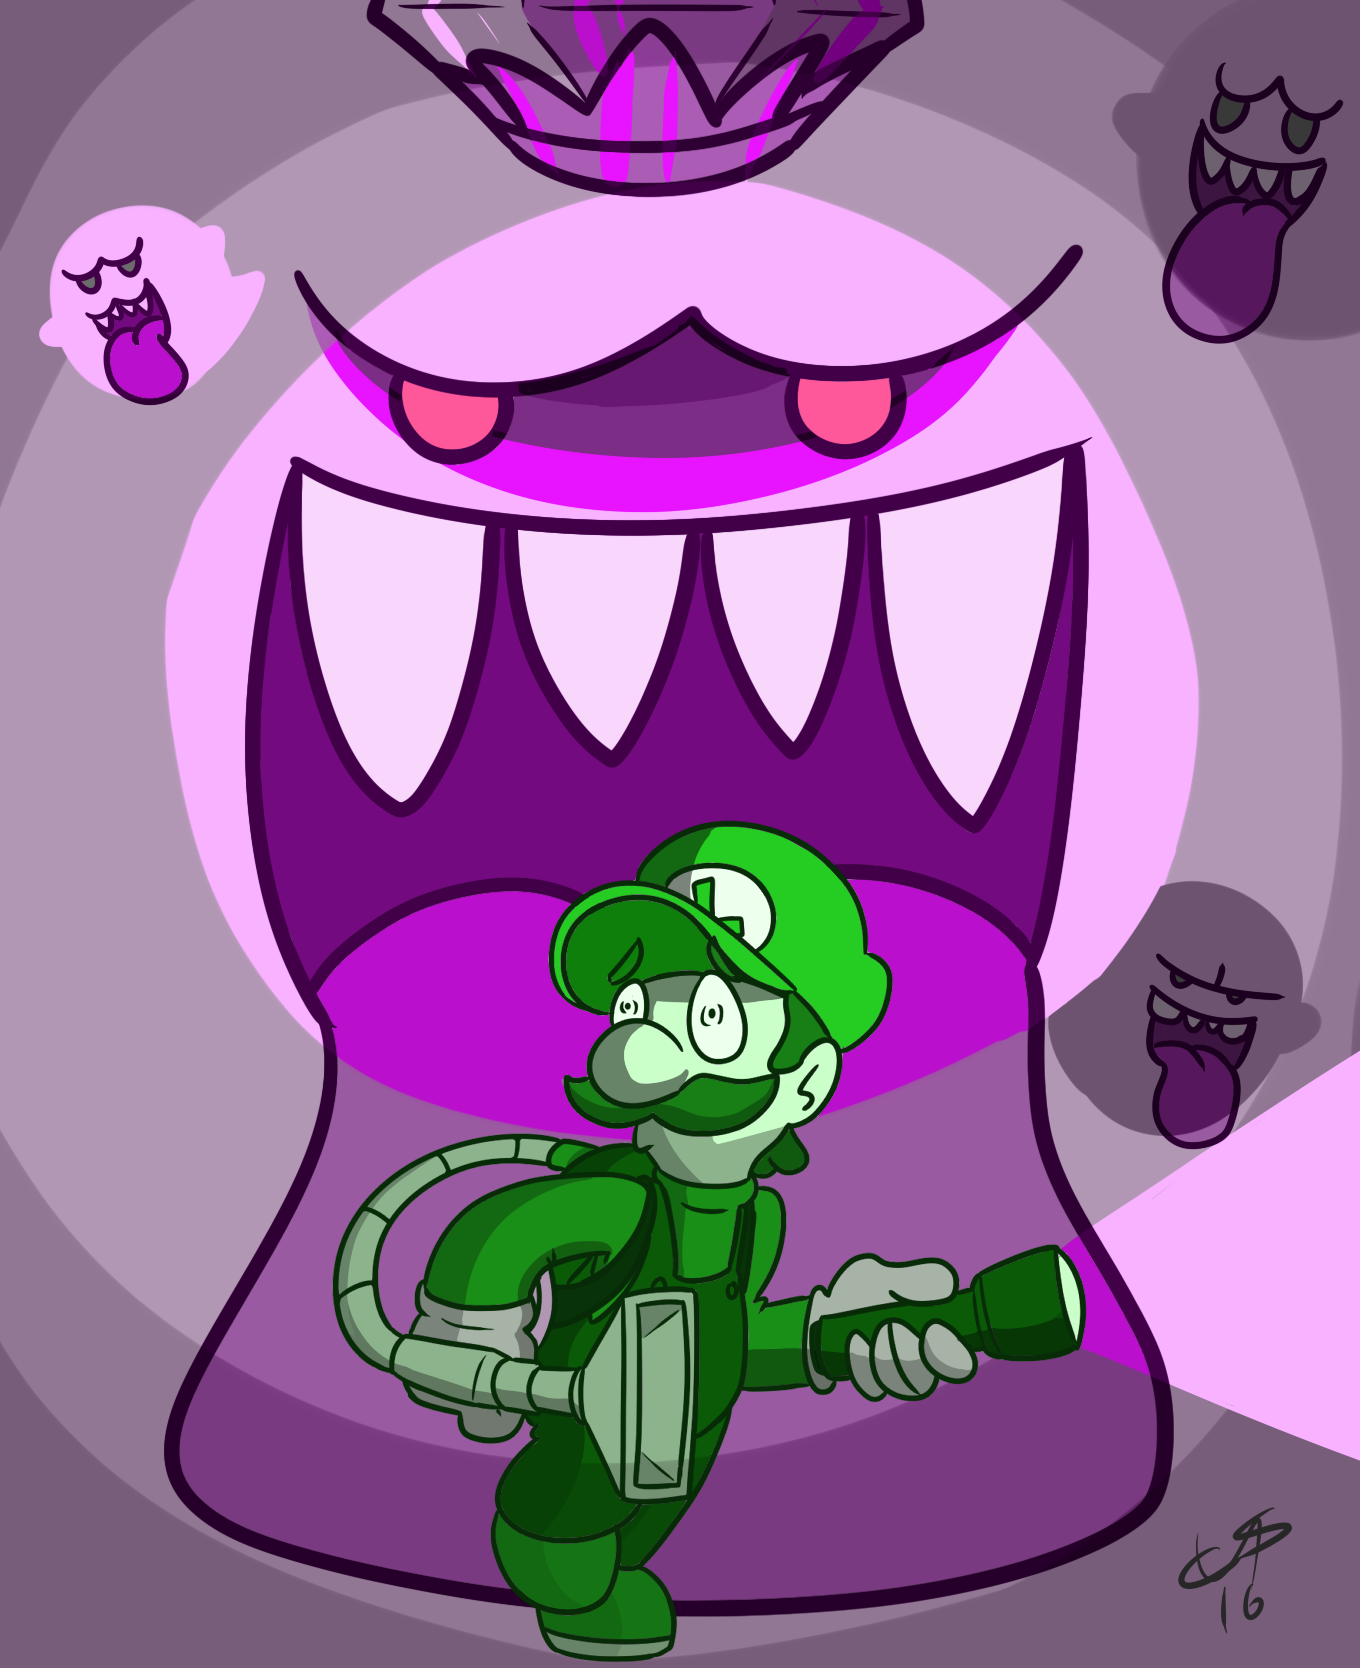 Luigi's mansion and nightmare